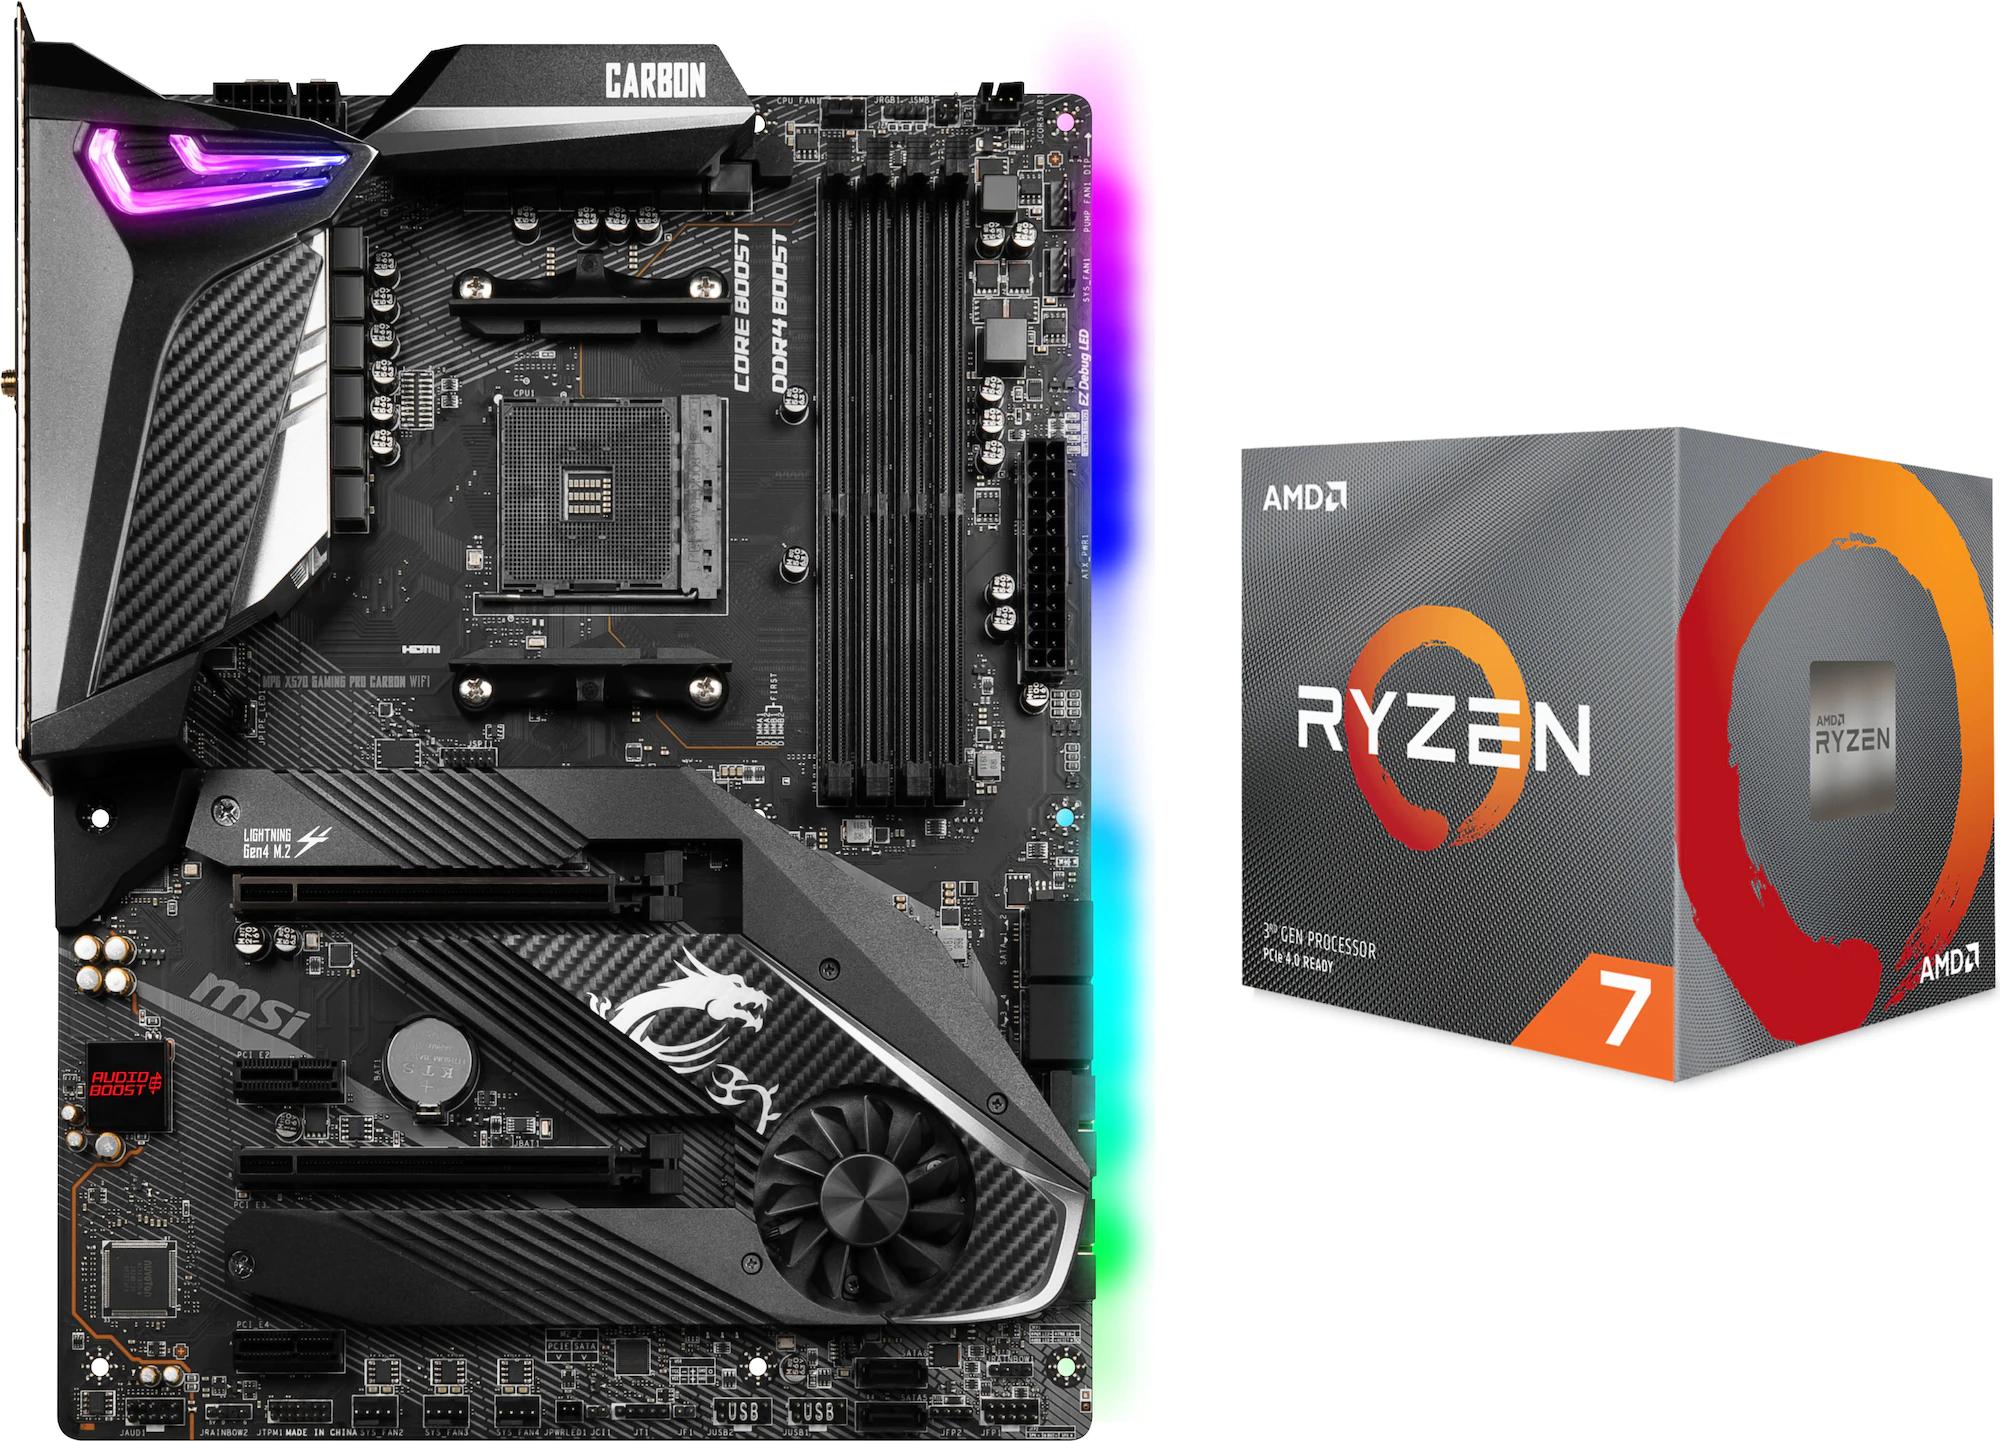 Pack carte mère MSI X570 Gaming Pro Carbon Wifi + Processeur Ryzen 7 3700X - AM4, AMD X570, ATX ( Frontaliers Suisse )